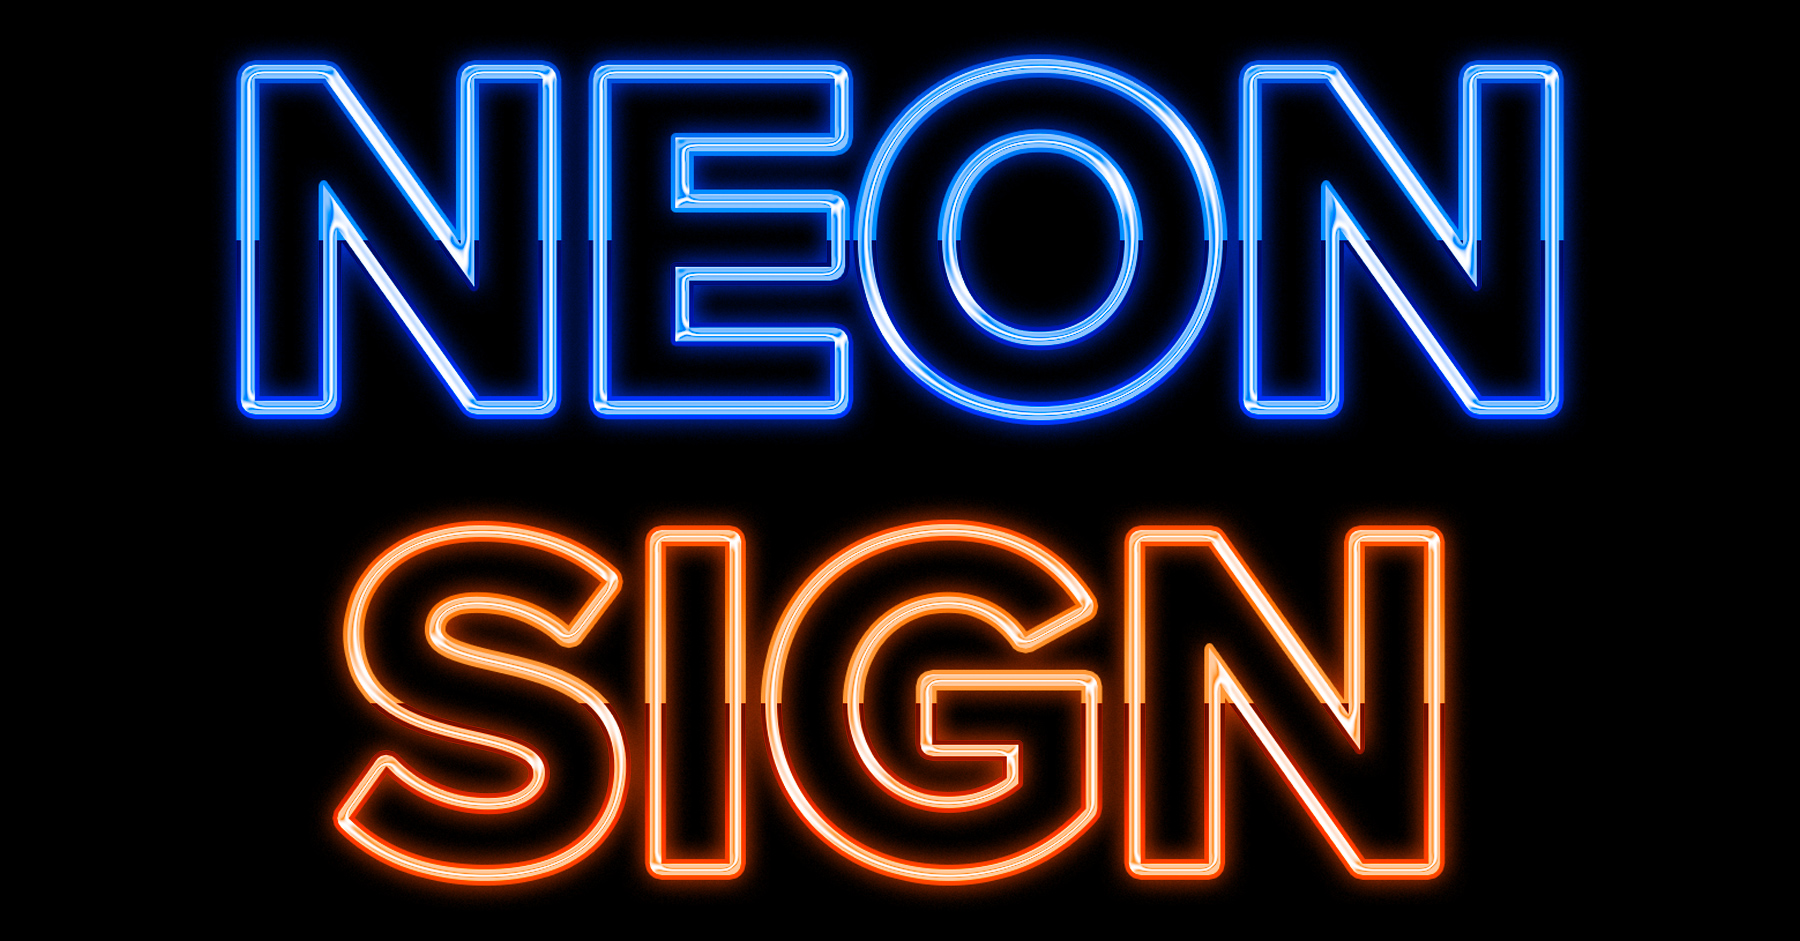 neon text photoshop tutorial